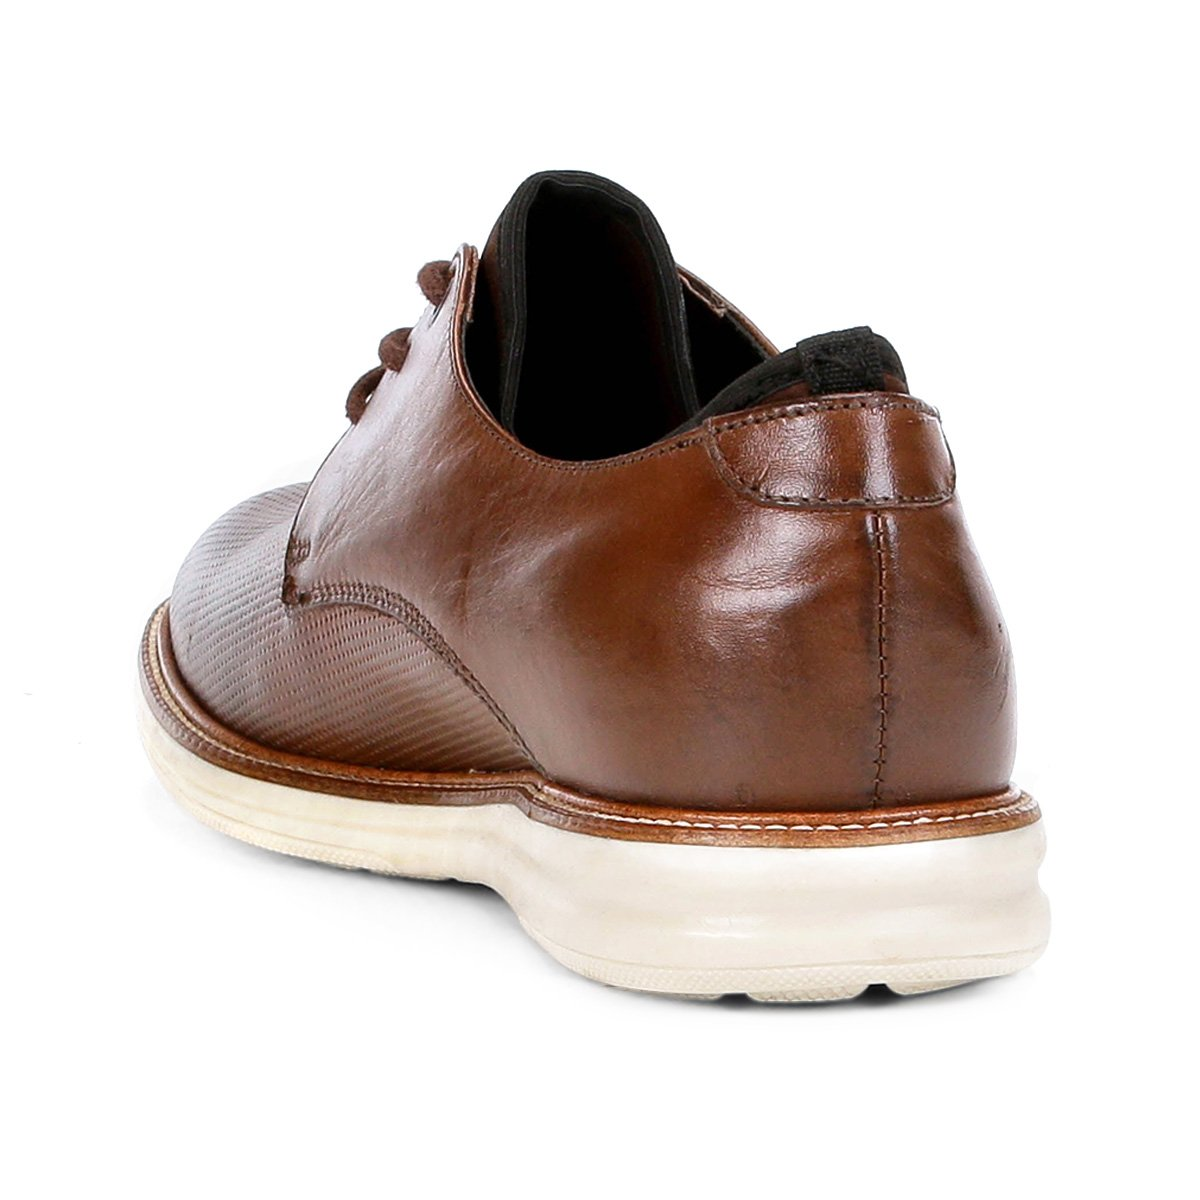 Couro Marrocos Sapato Masculino Casual Marrom Sapato Perfuros Casual Mariner zYtcwHqO